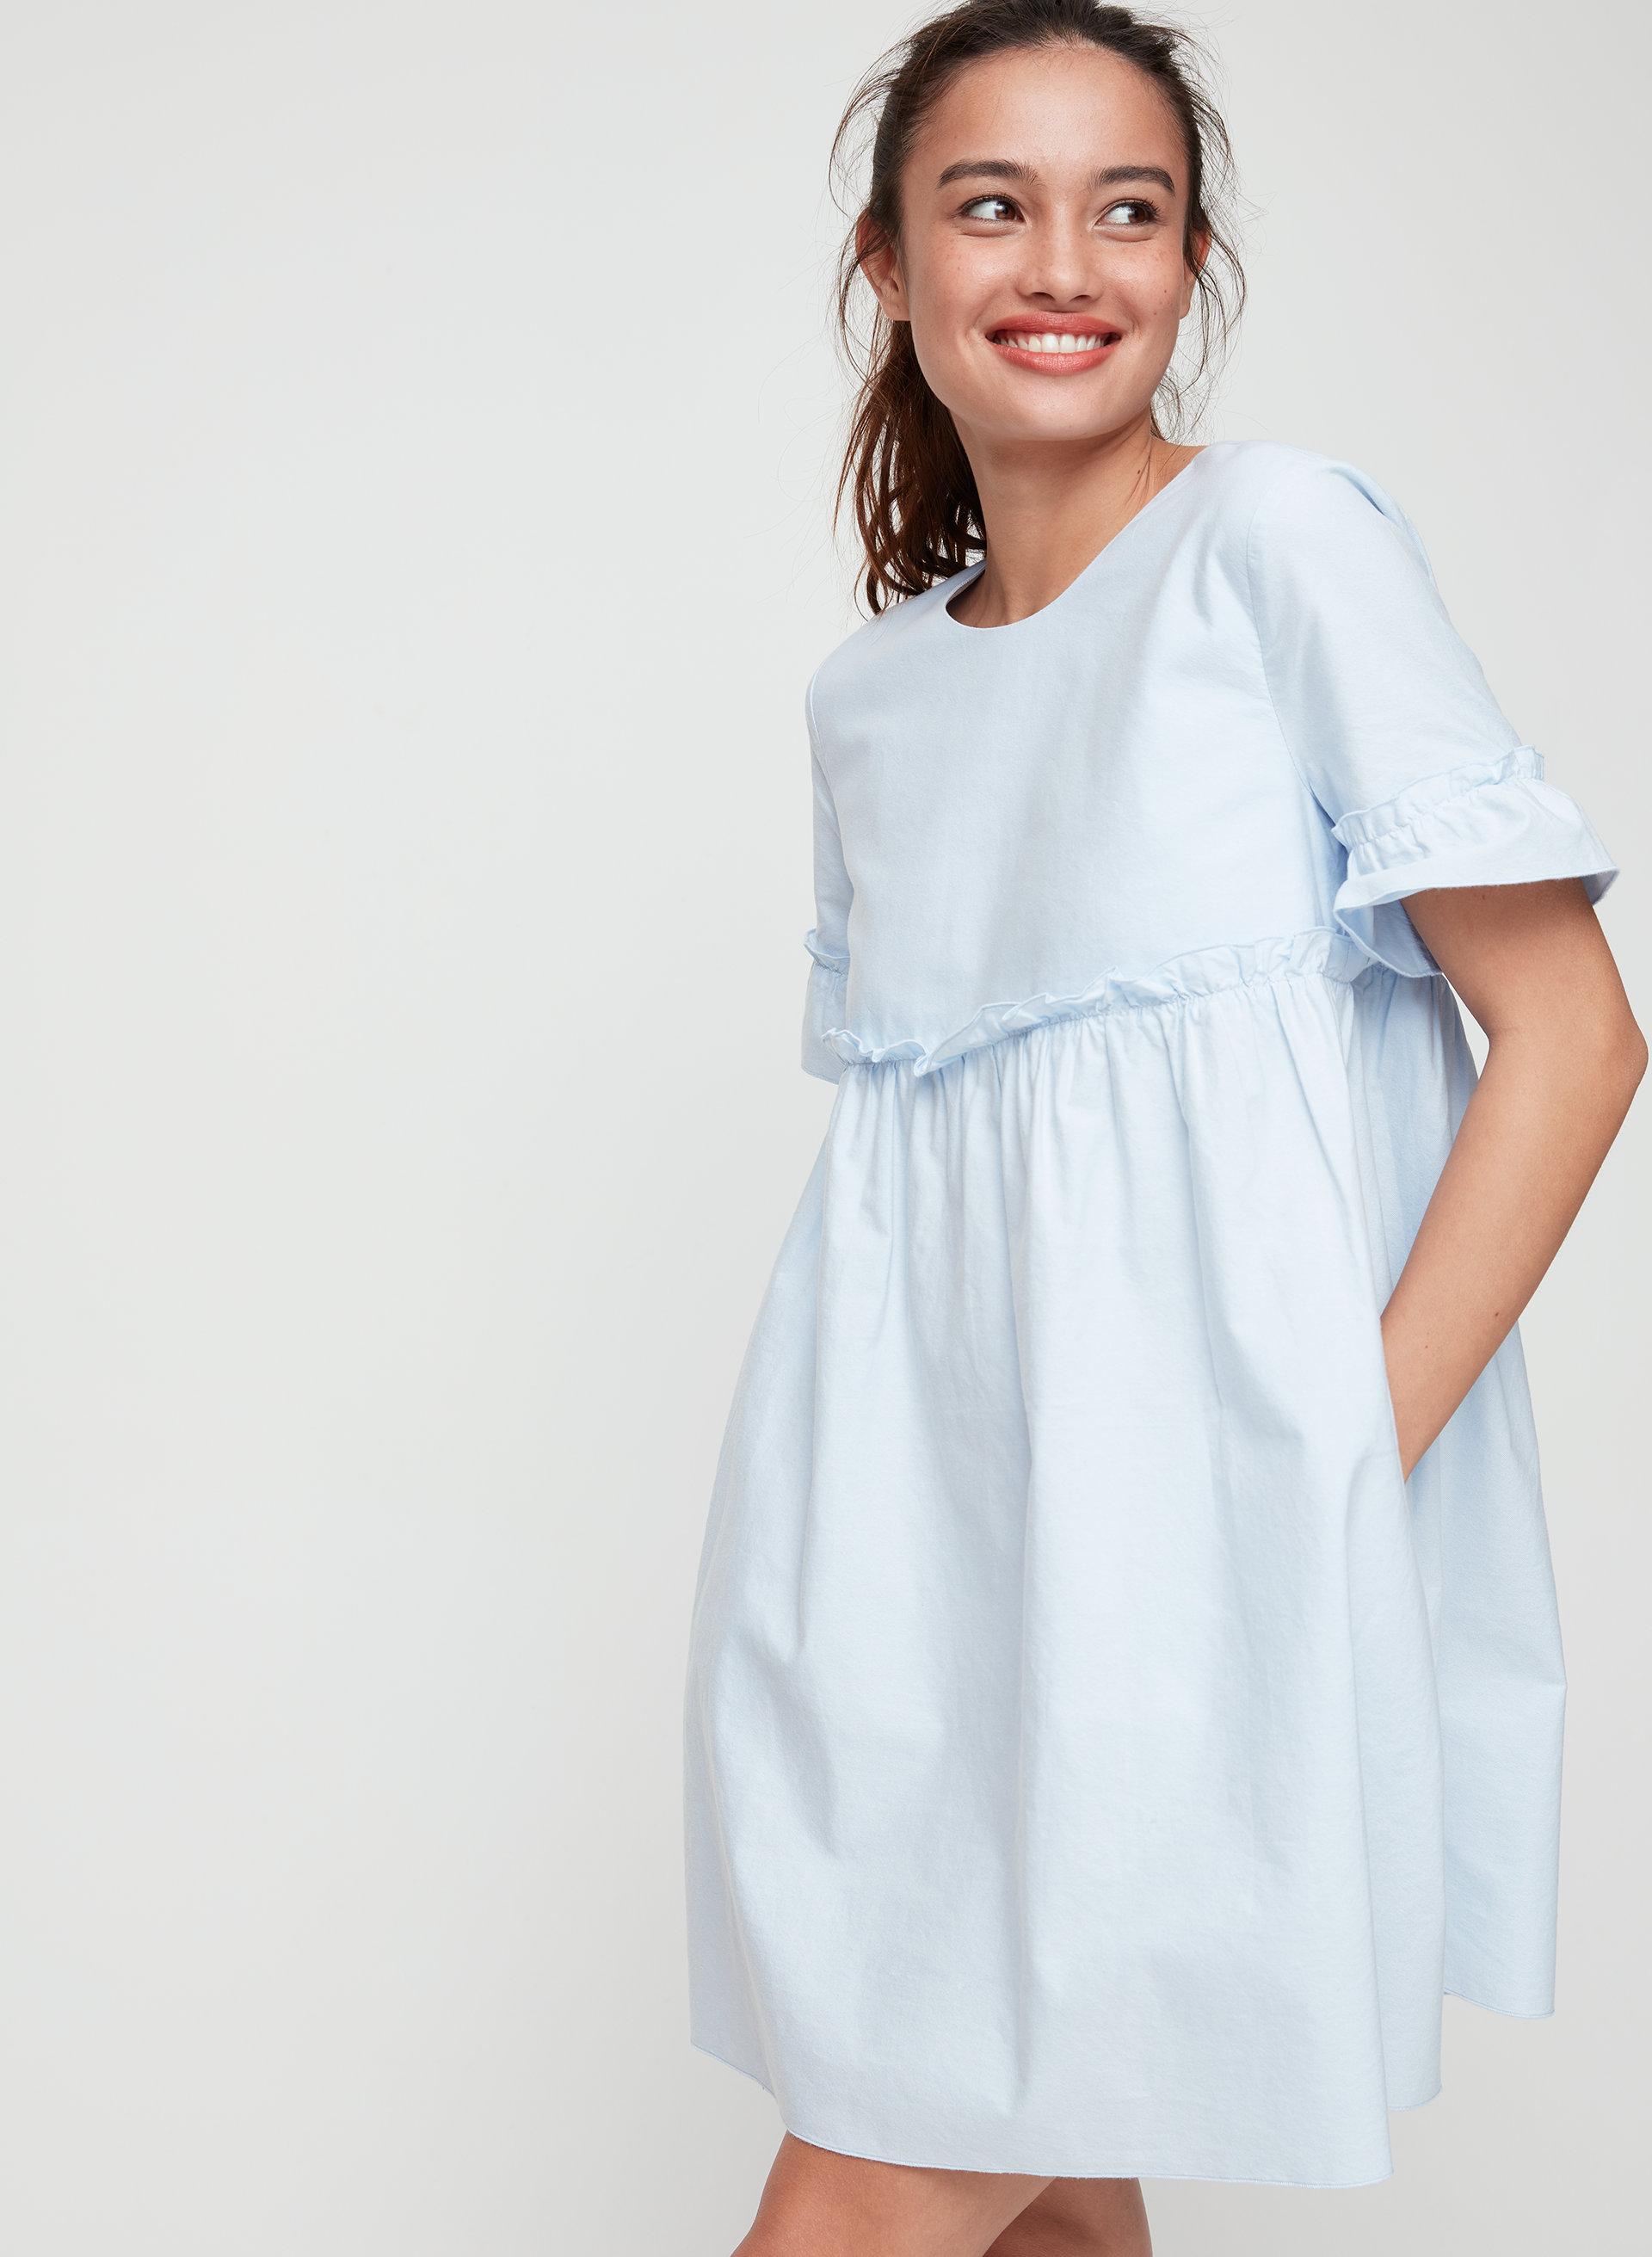 Short Sleeve Empire Dress